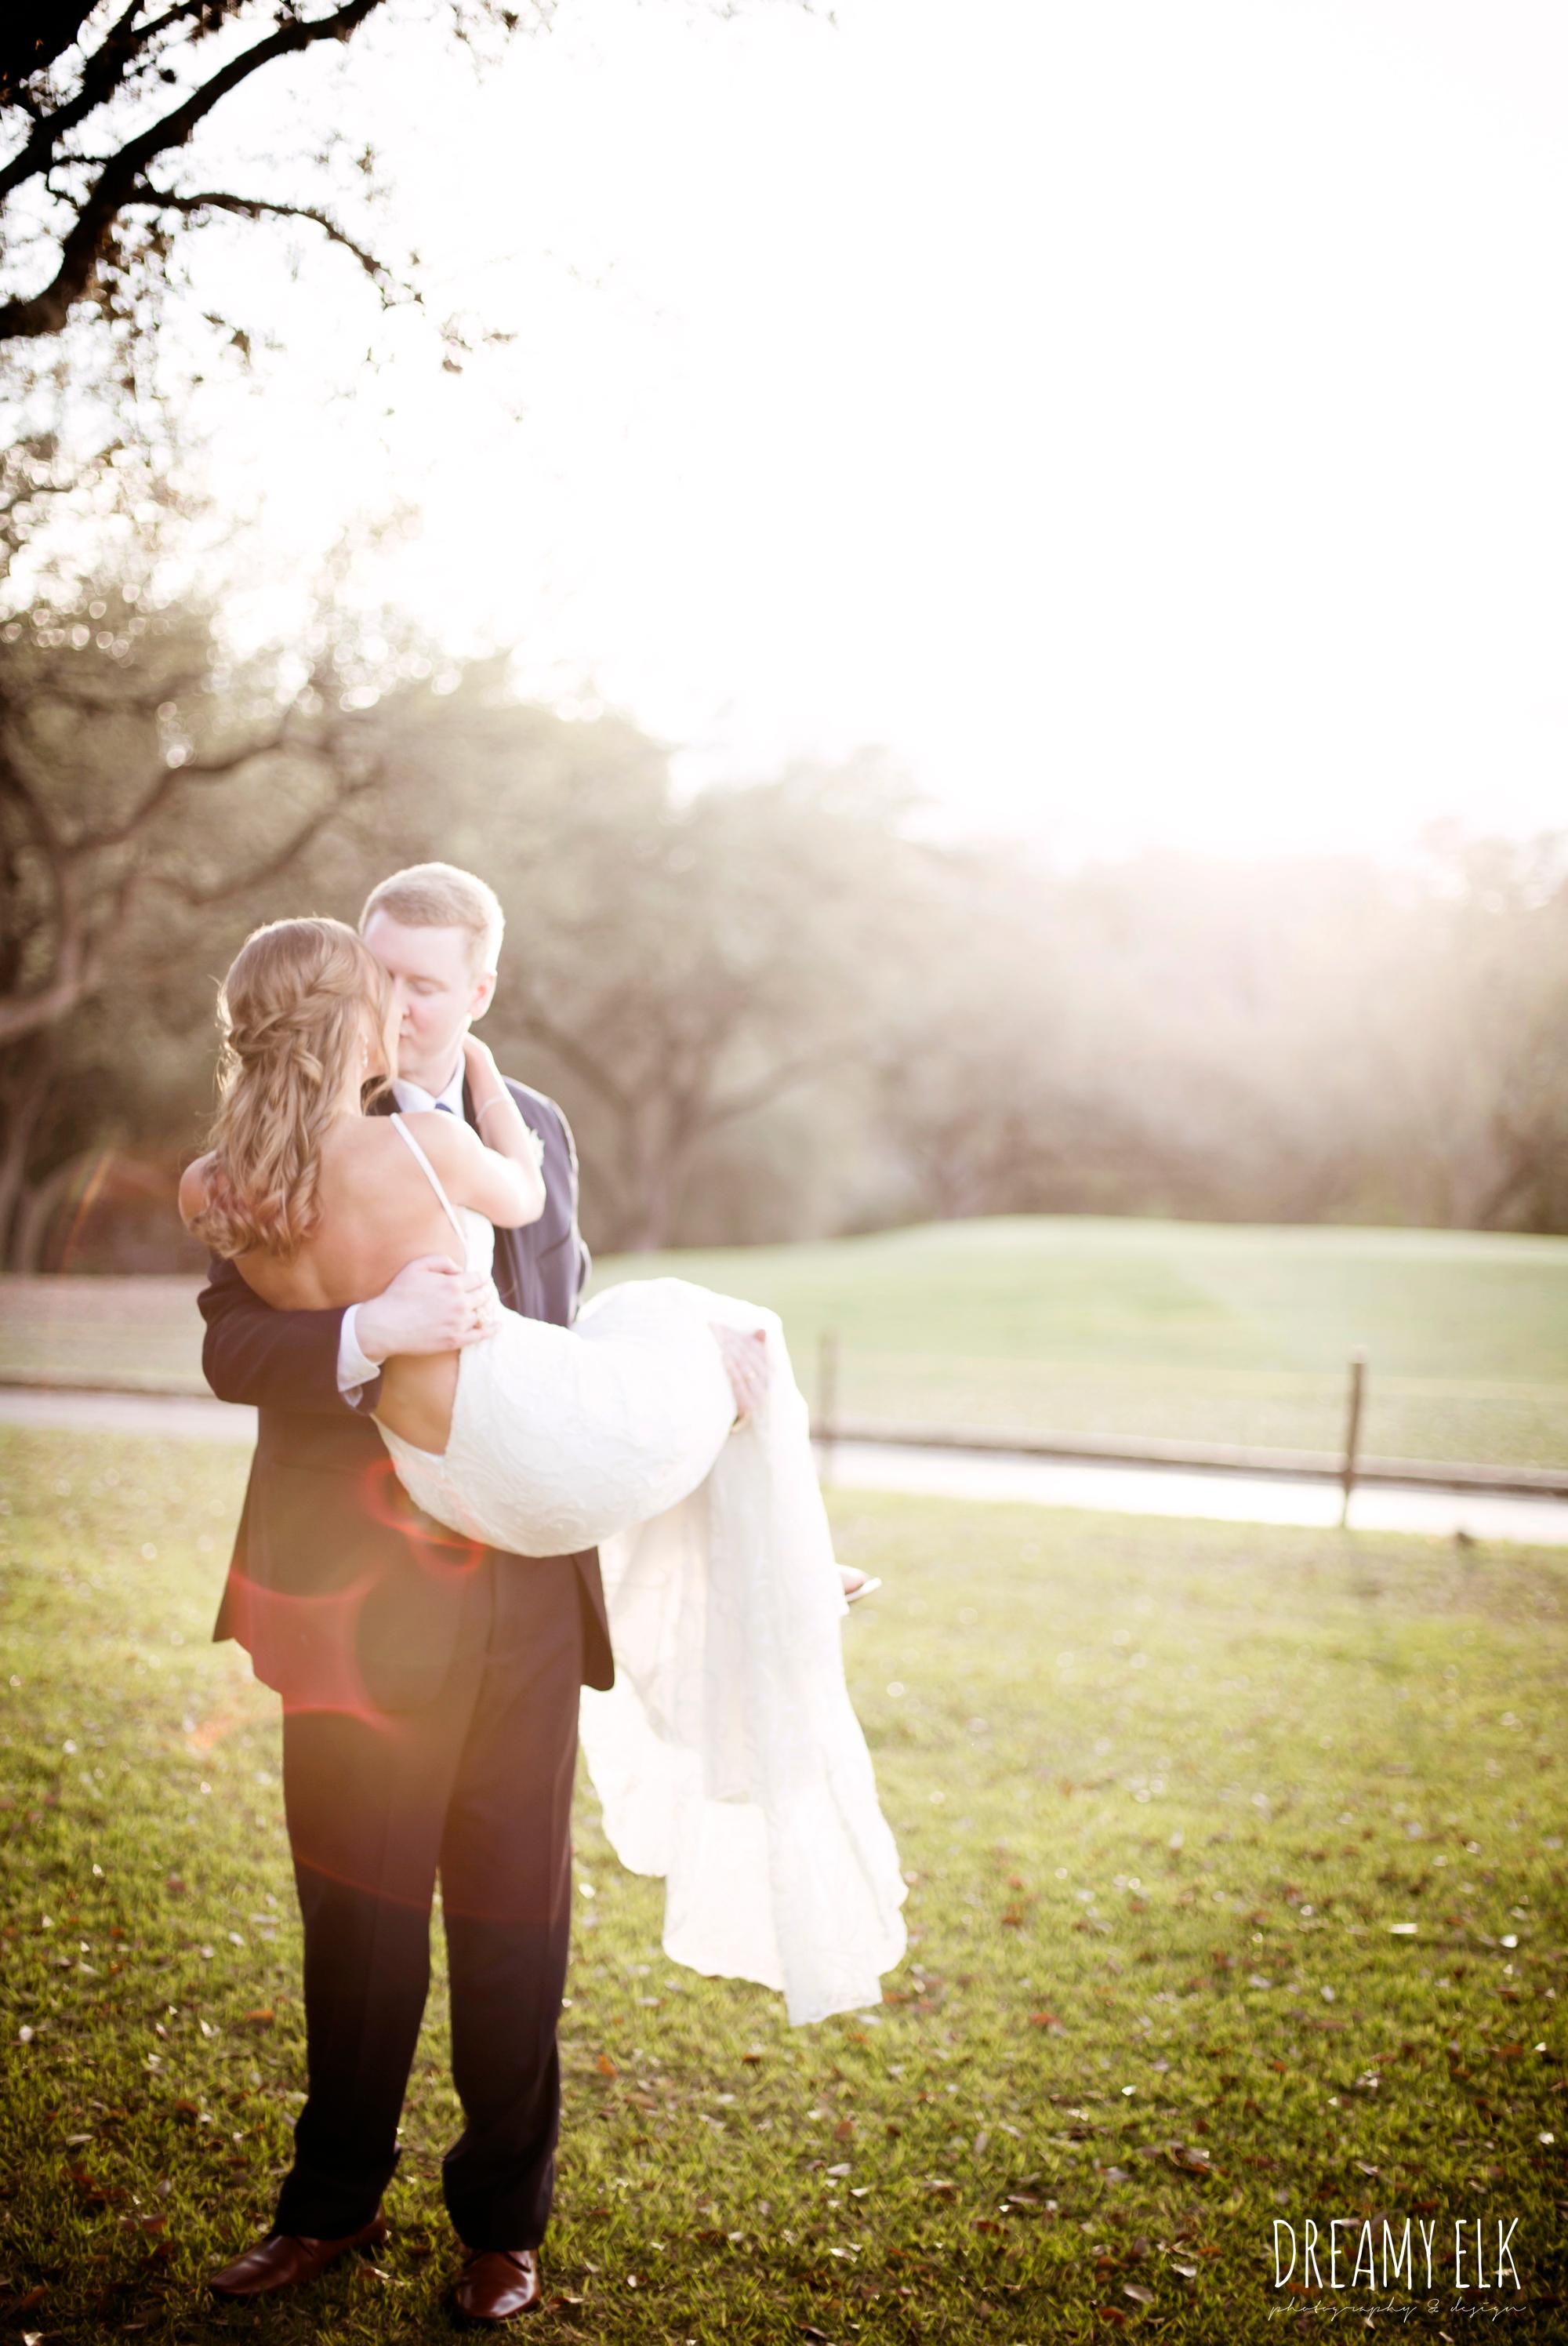 groom holding bride, sunset, romantic, bride and groom, navy suit, backless column sheath wedding dress, cloudy march wedding photo, canyon springs golf club wedding, san antonio, texas {dreamy elk photography and design}